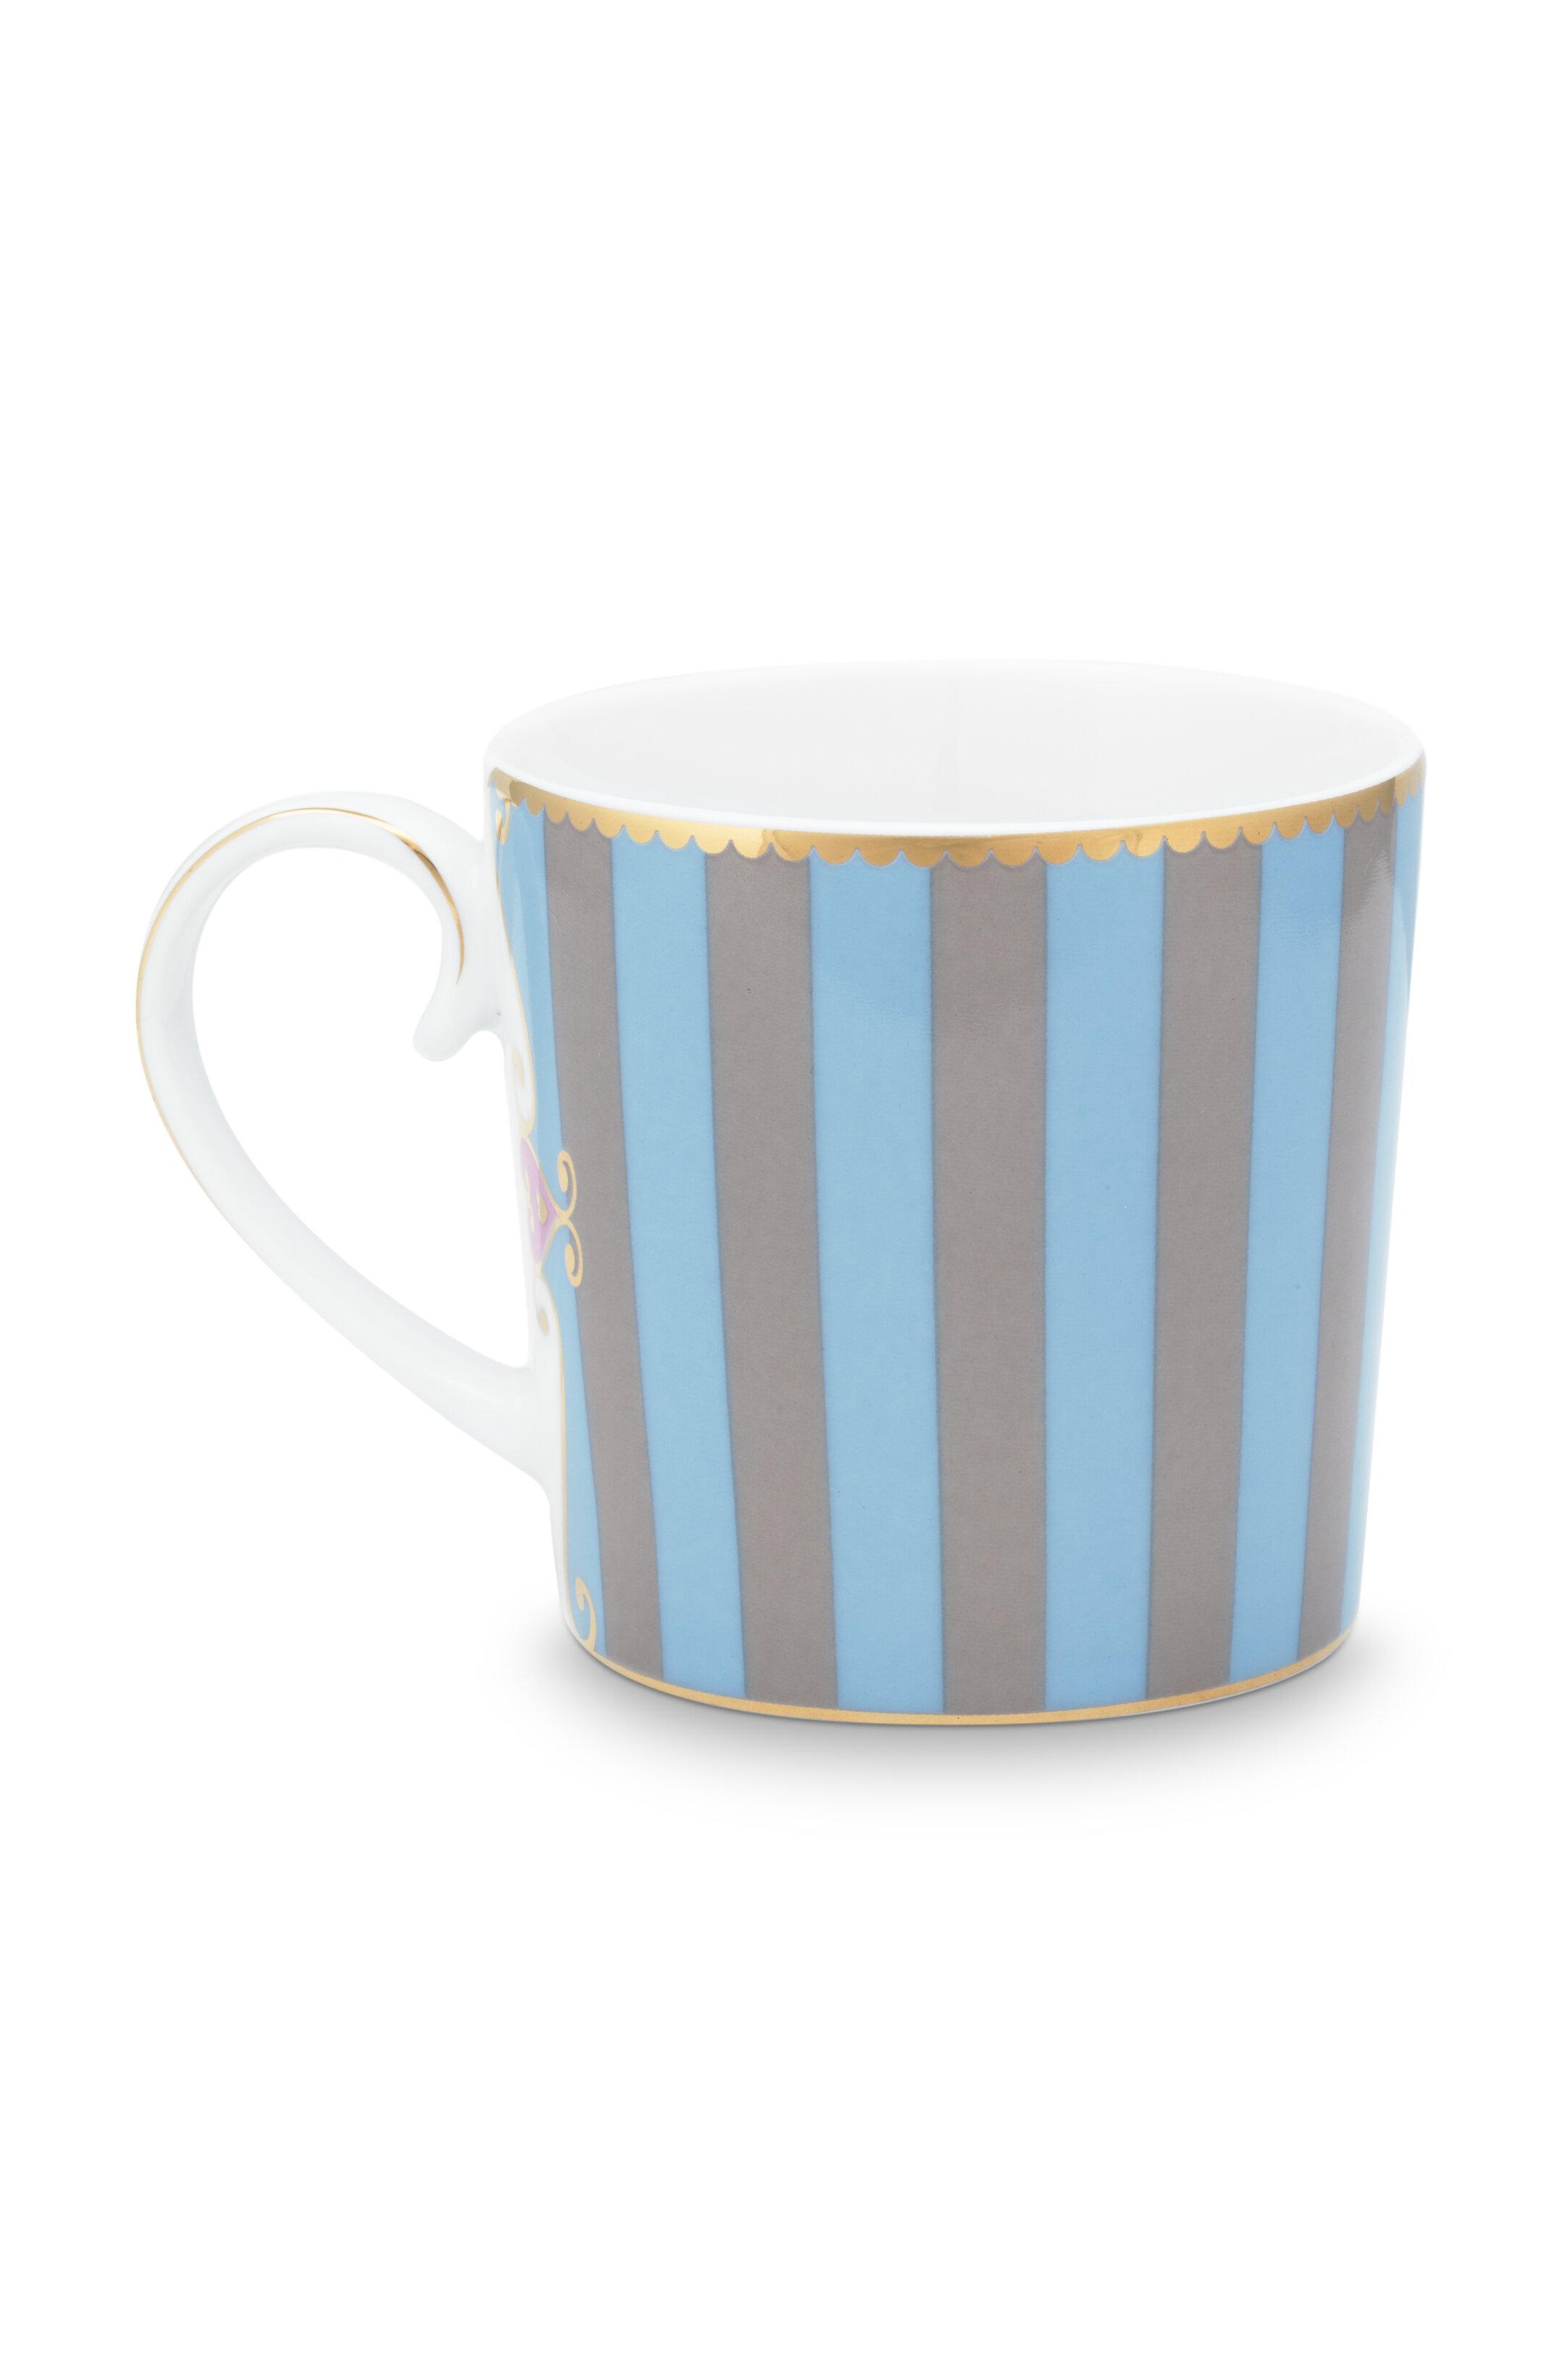 Pip Studio Love Birds Tasse Klein Stripes Blau-Khaki